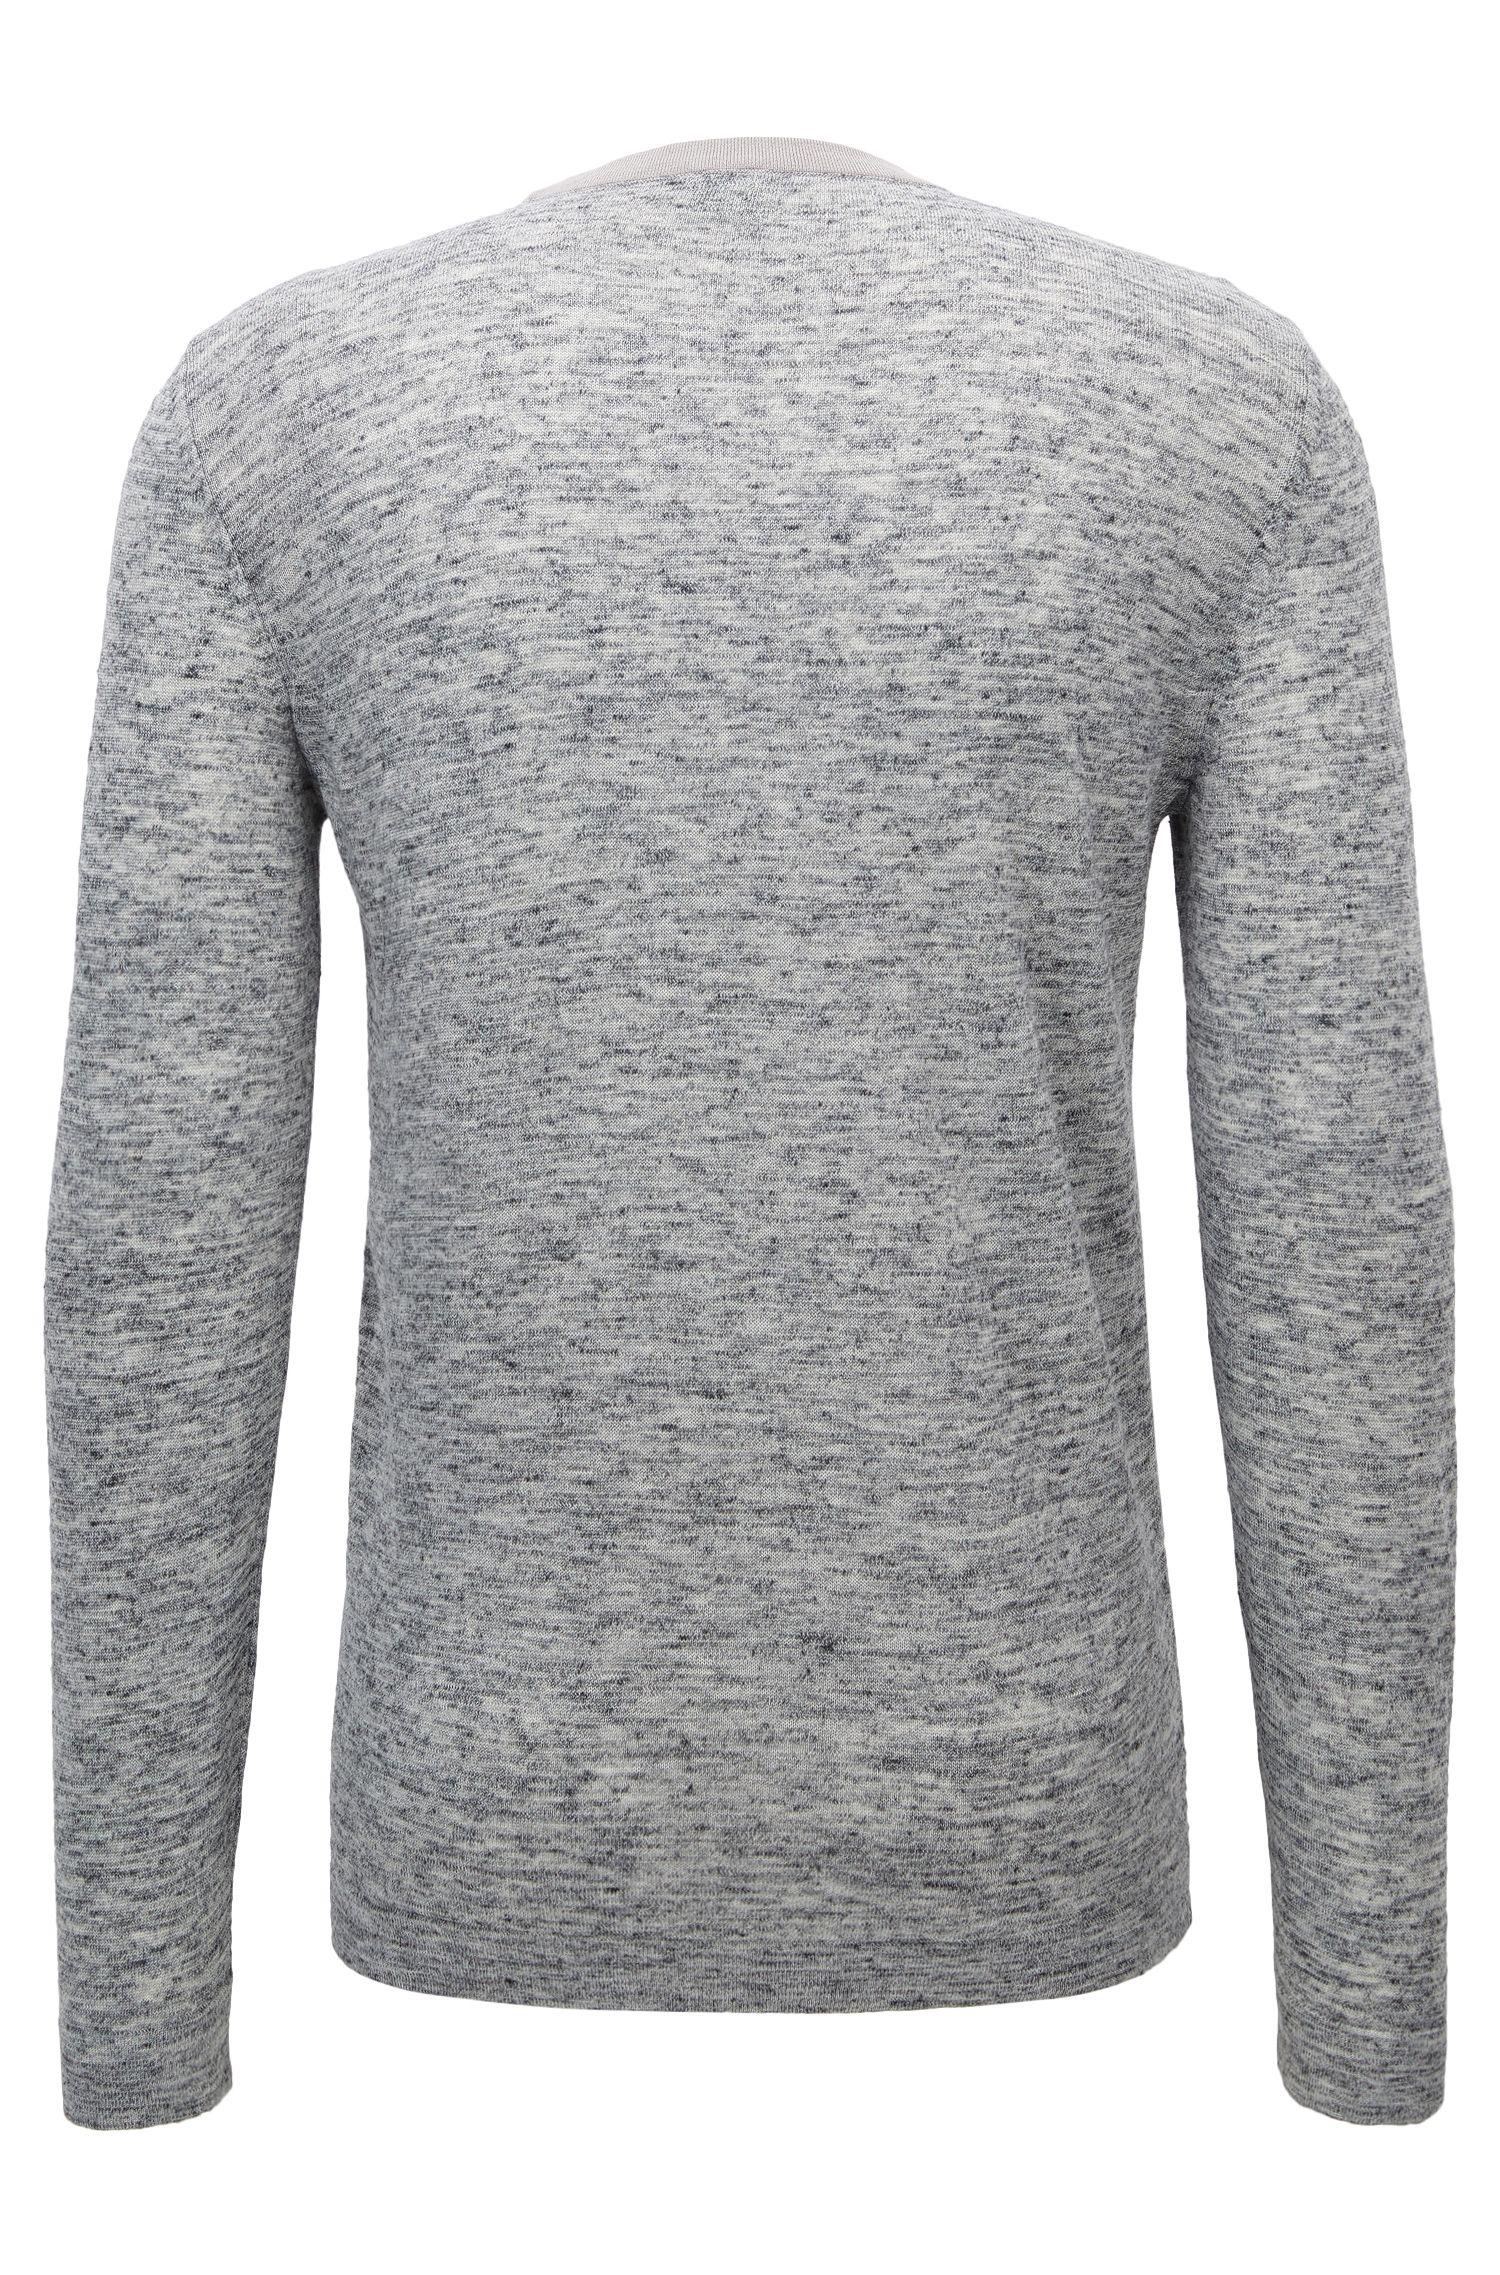 Melange Stretch Virgin Wool Blend Sweater | Renny